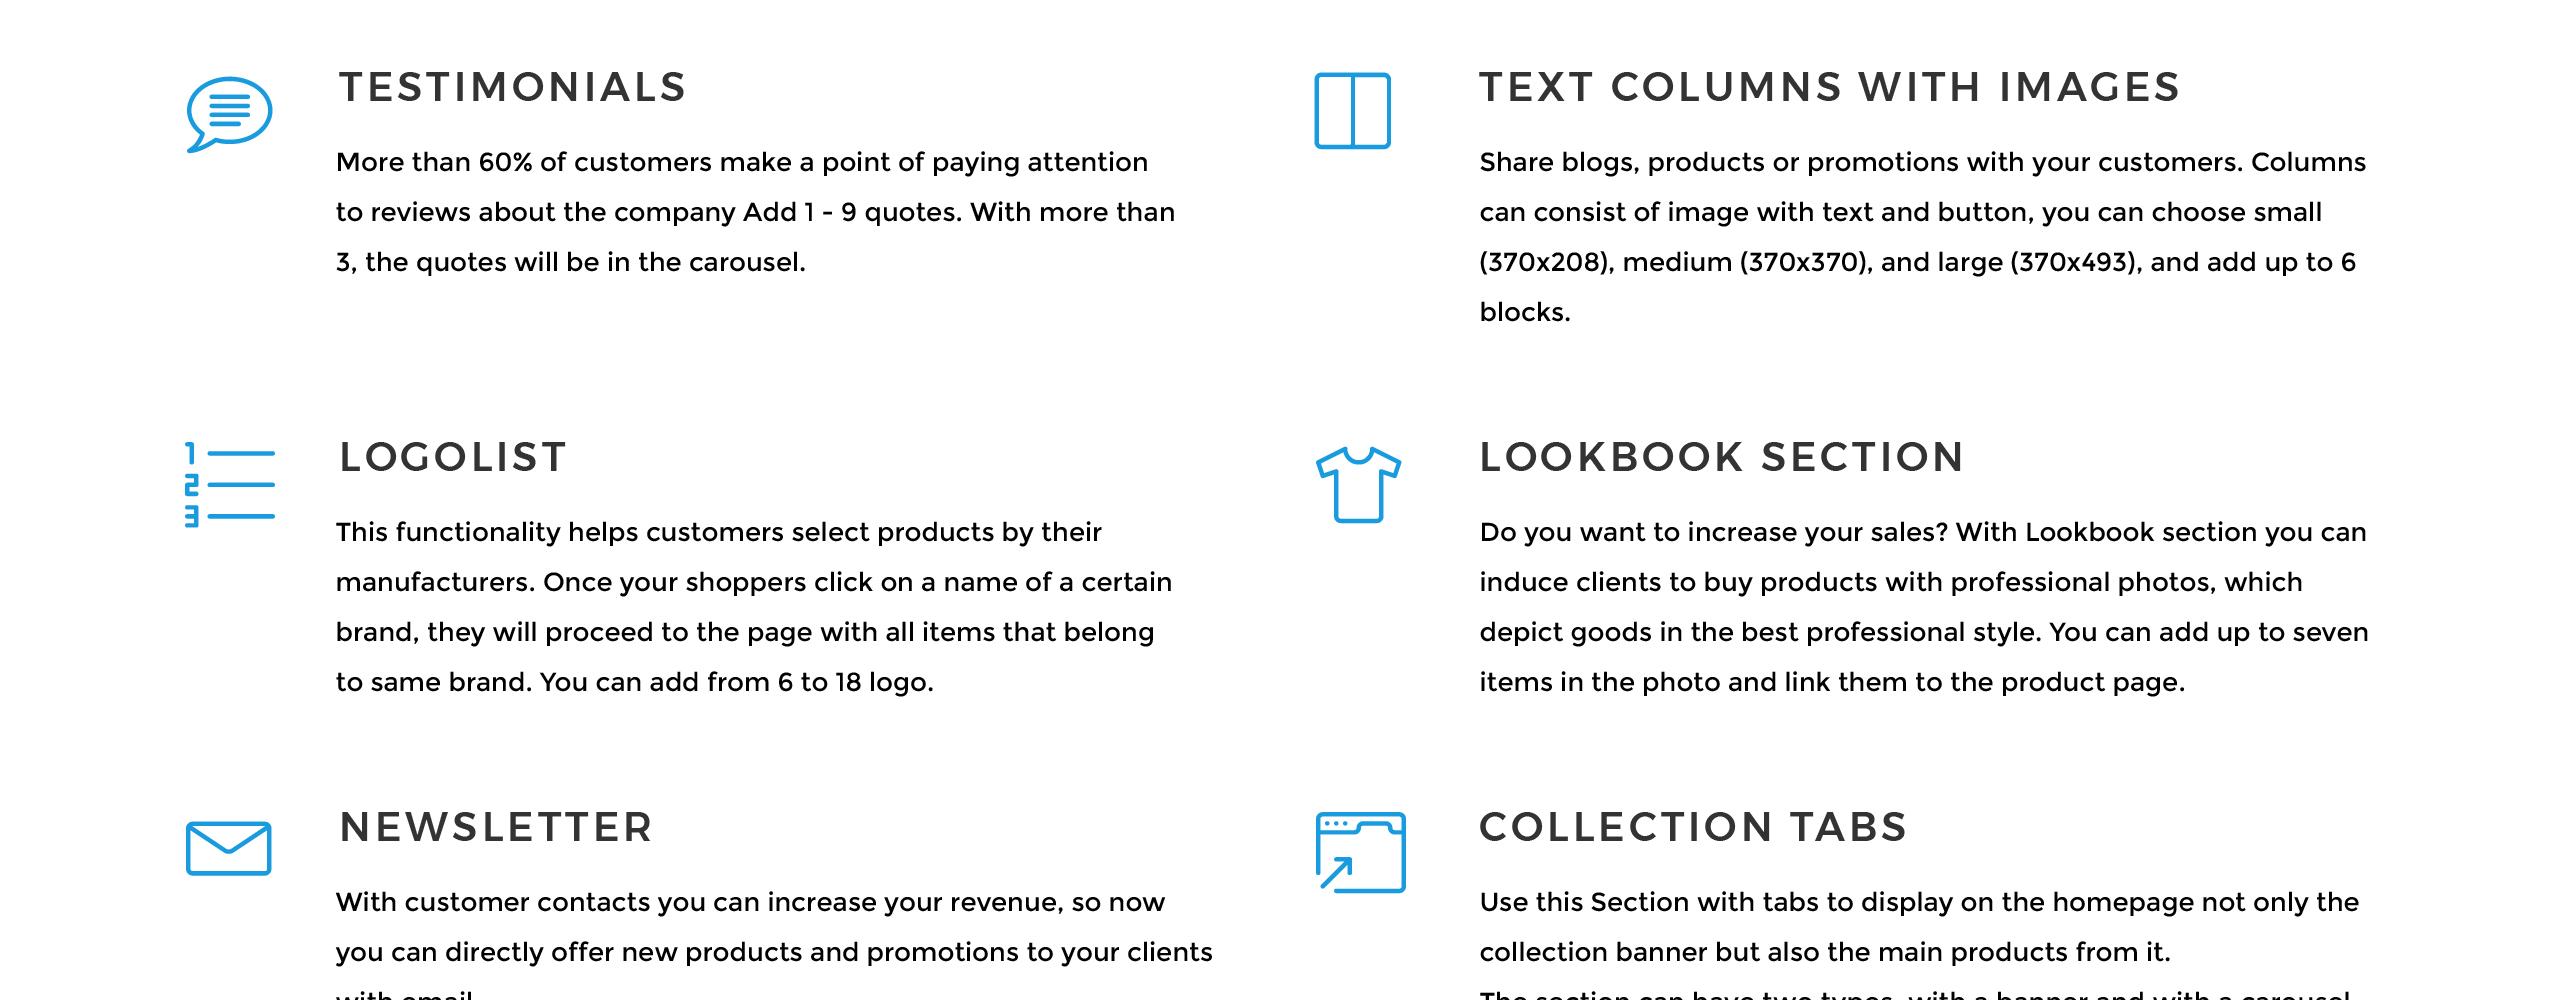 Website Design Template 71168 - children clothes clothing ecommerce estore  fashion kids modern online shop shopify. >>